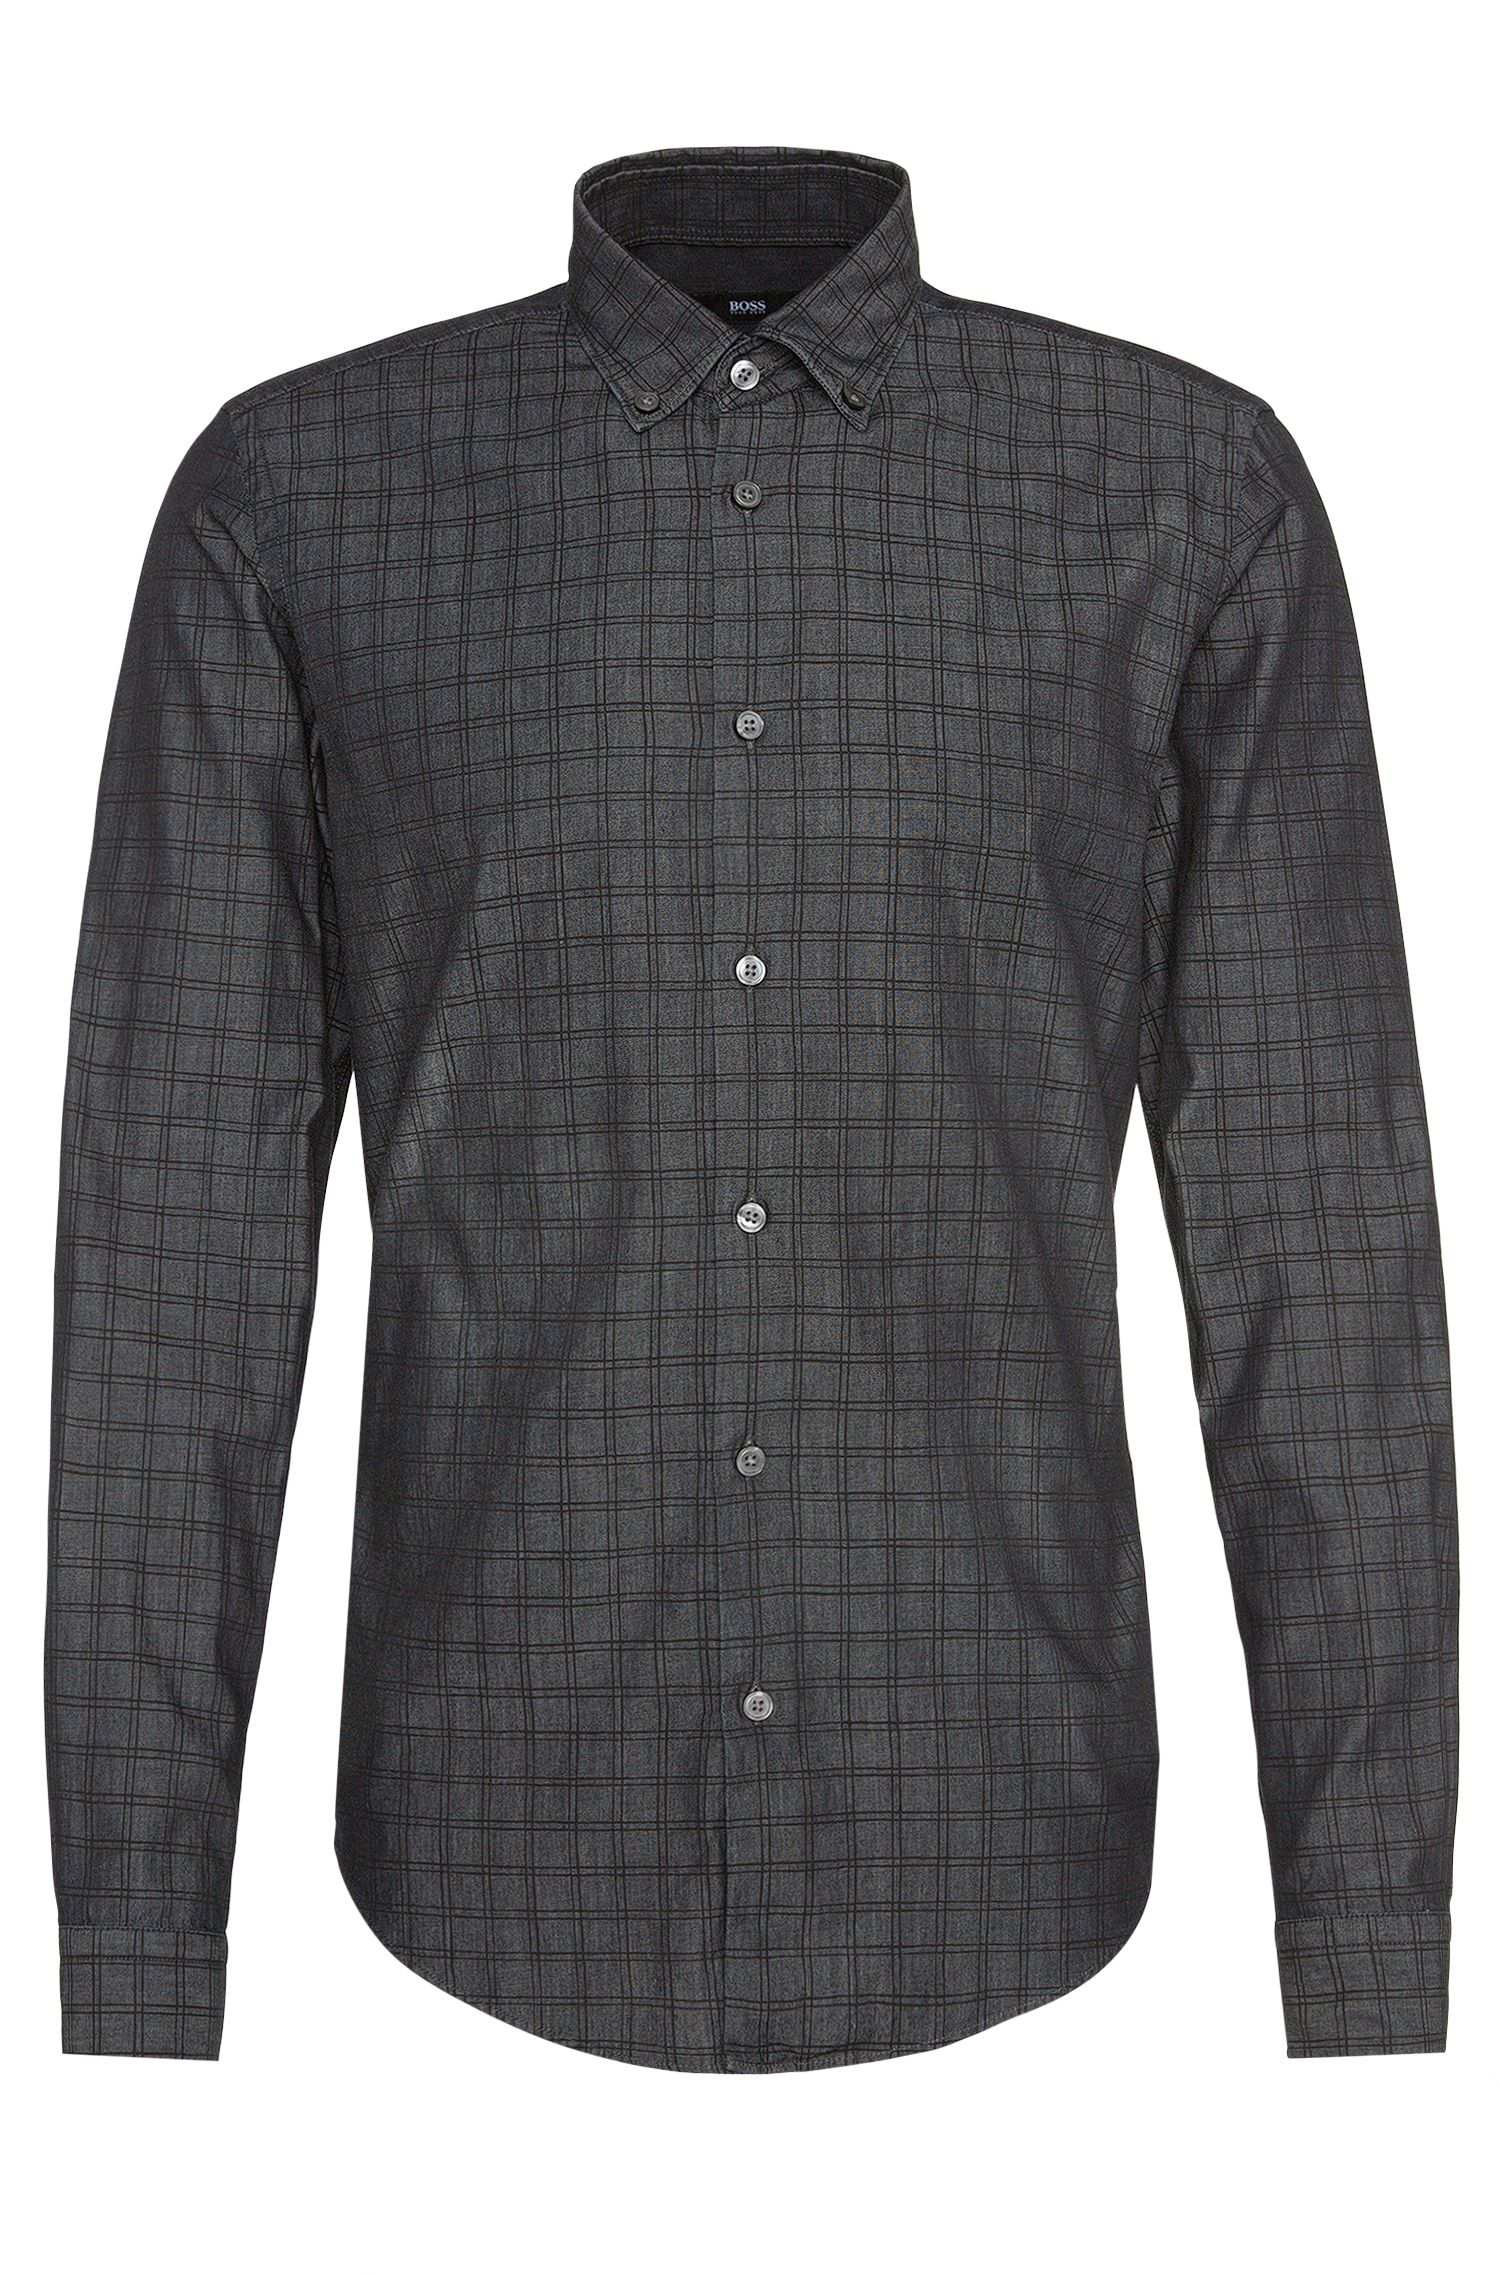 Gemustertes Slim-Fit-Hemd aus Baumwolle: 'Rod_34F'